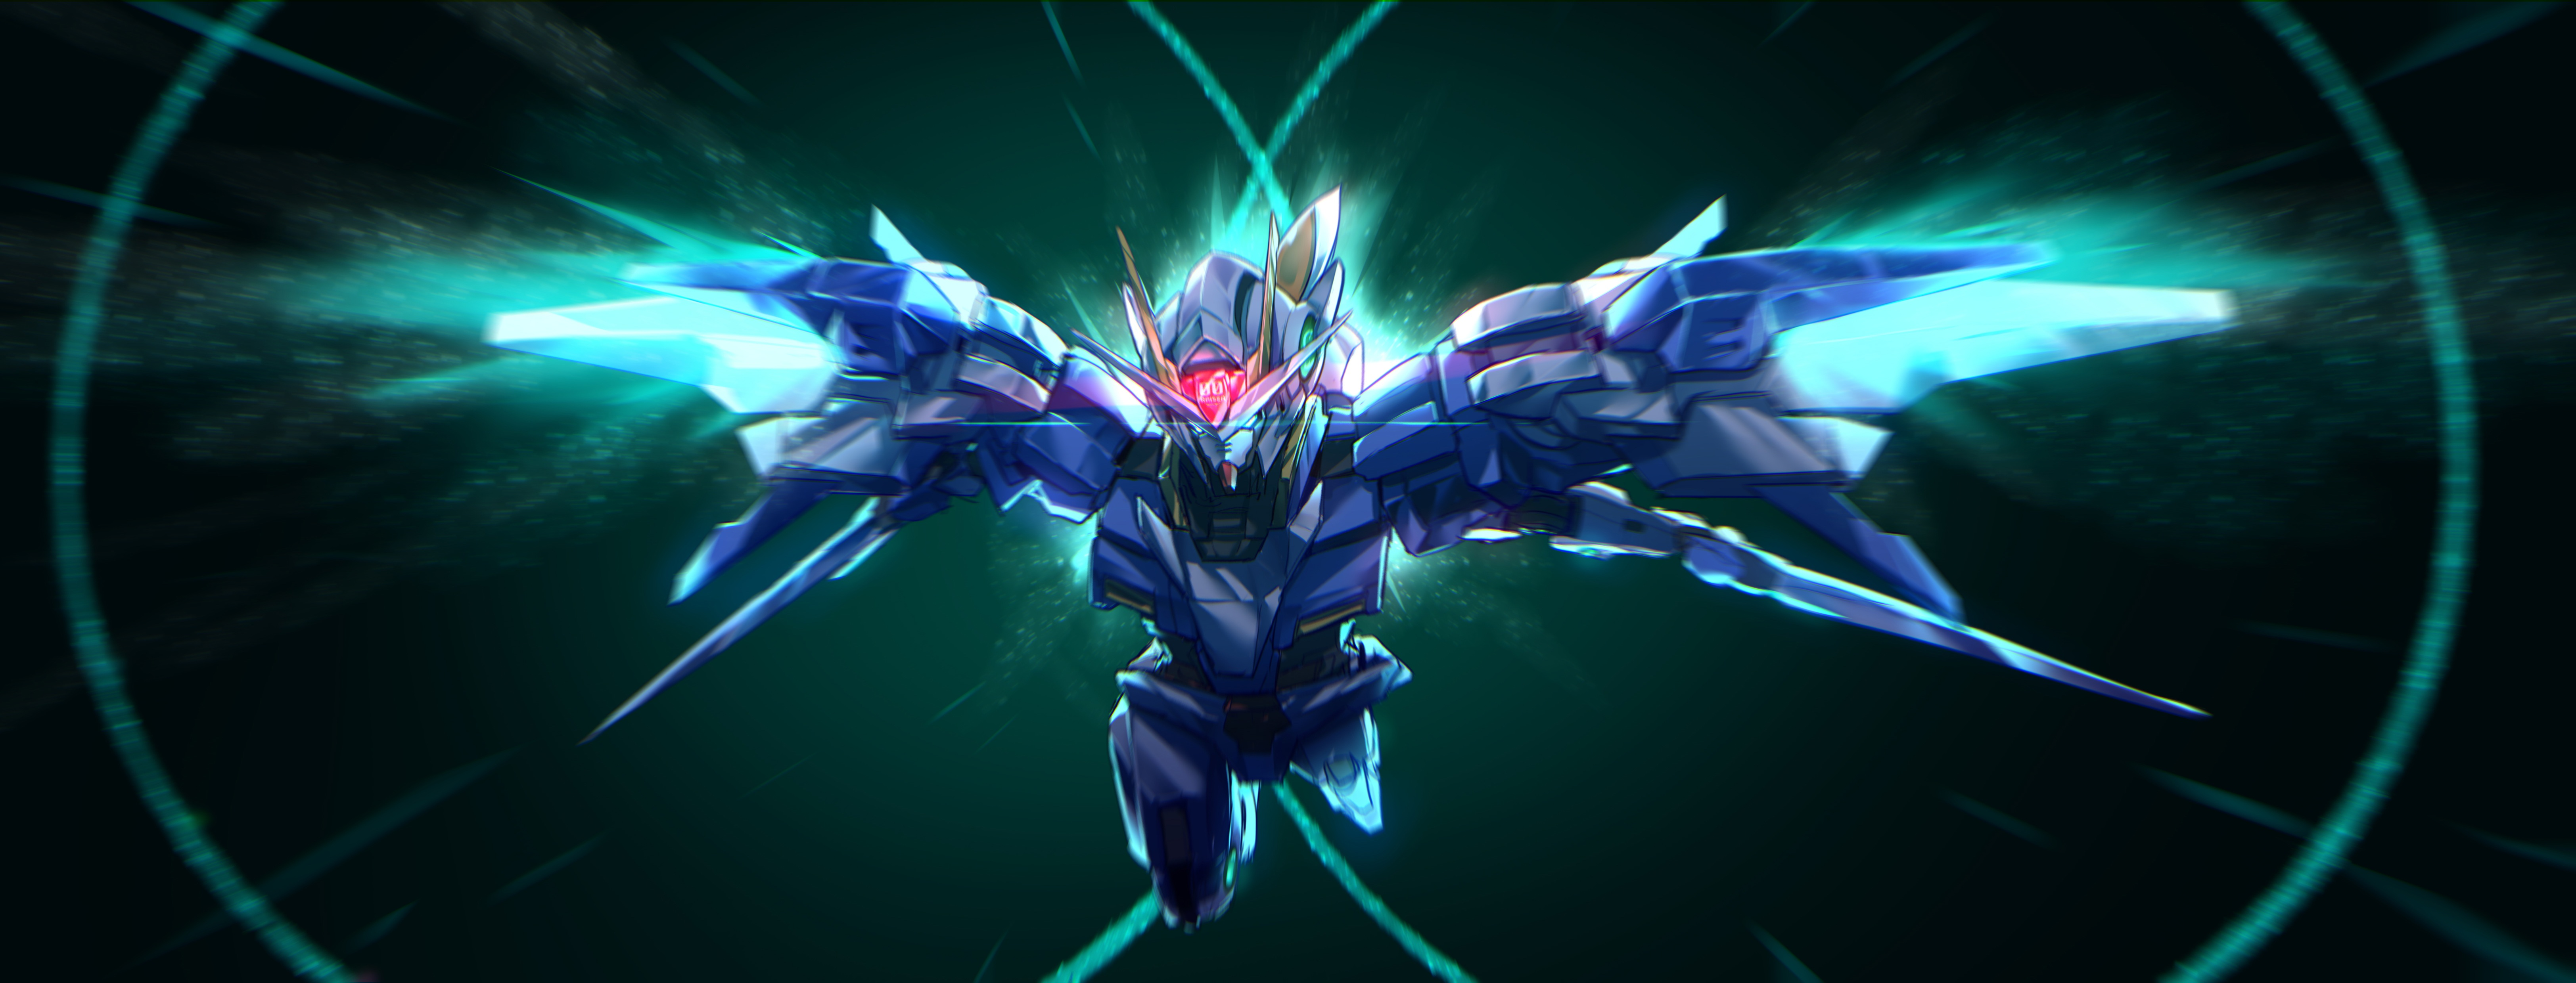 Mobile Suit Gundam 00 4k Ultra Hd Wallpaper Background Image